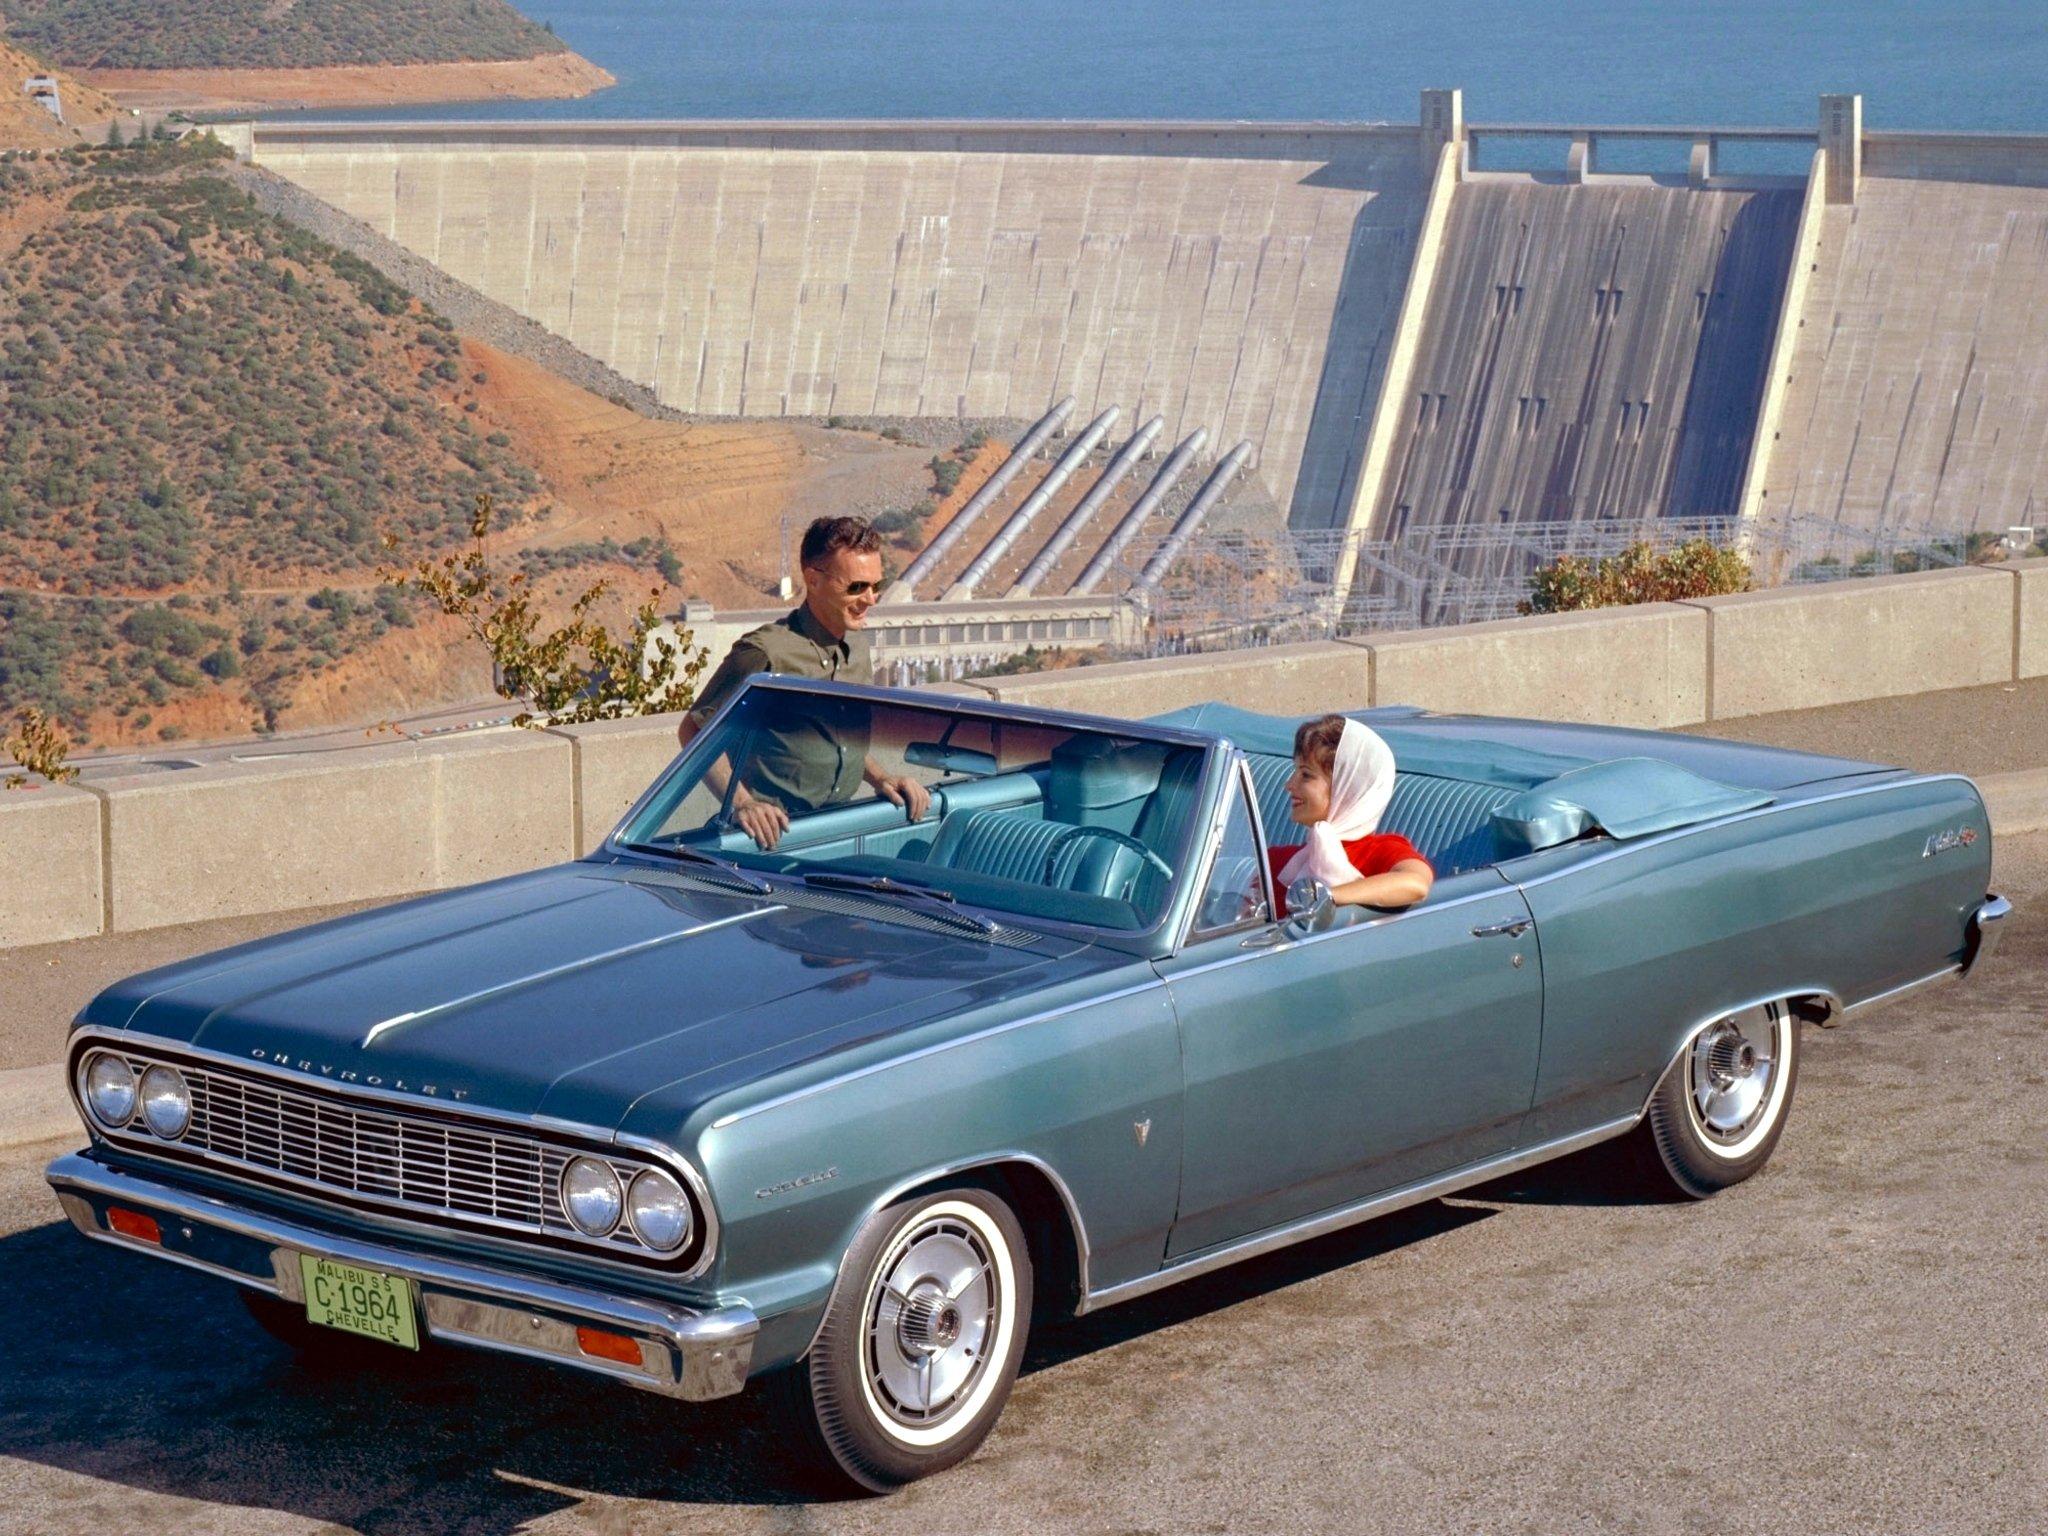 Chevelle Malibu S S Convertible 5758 67 muscle classic rt wallpaper 2048x1536